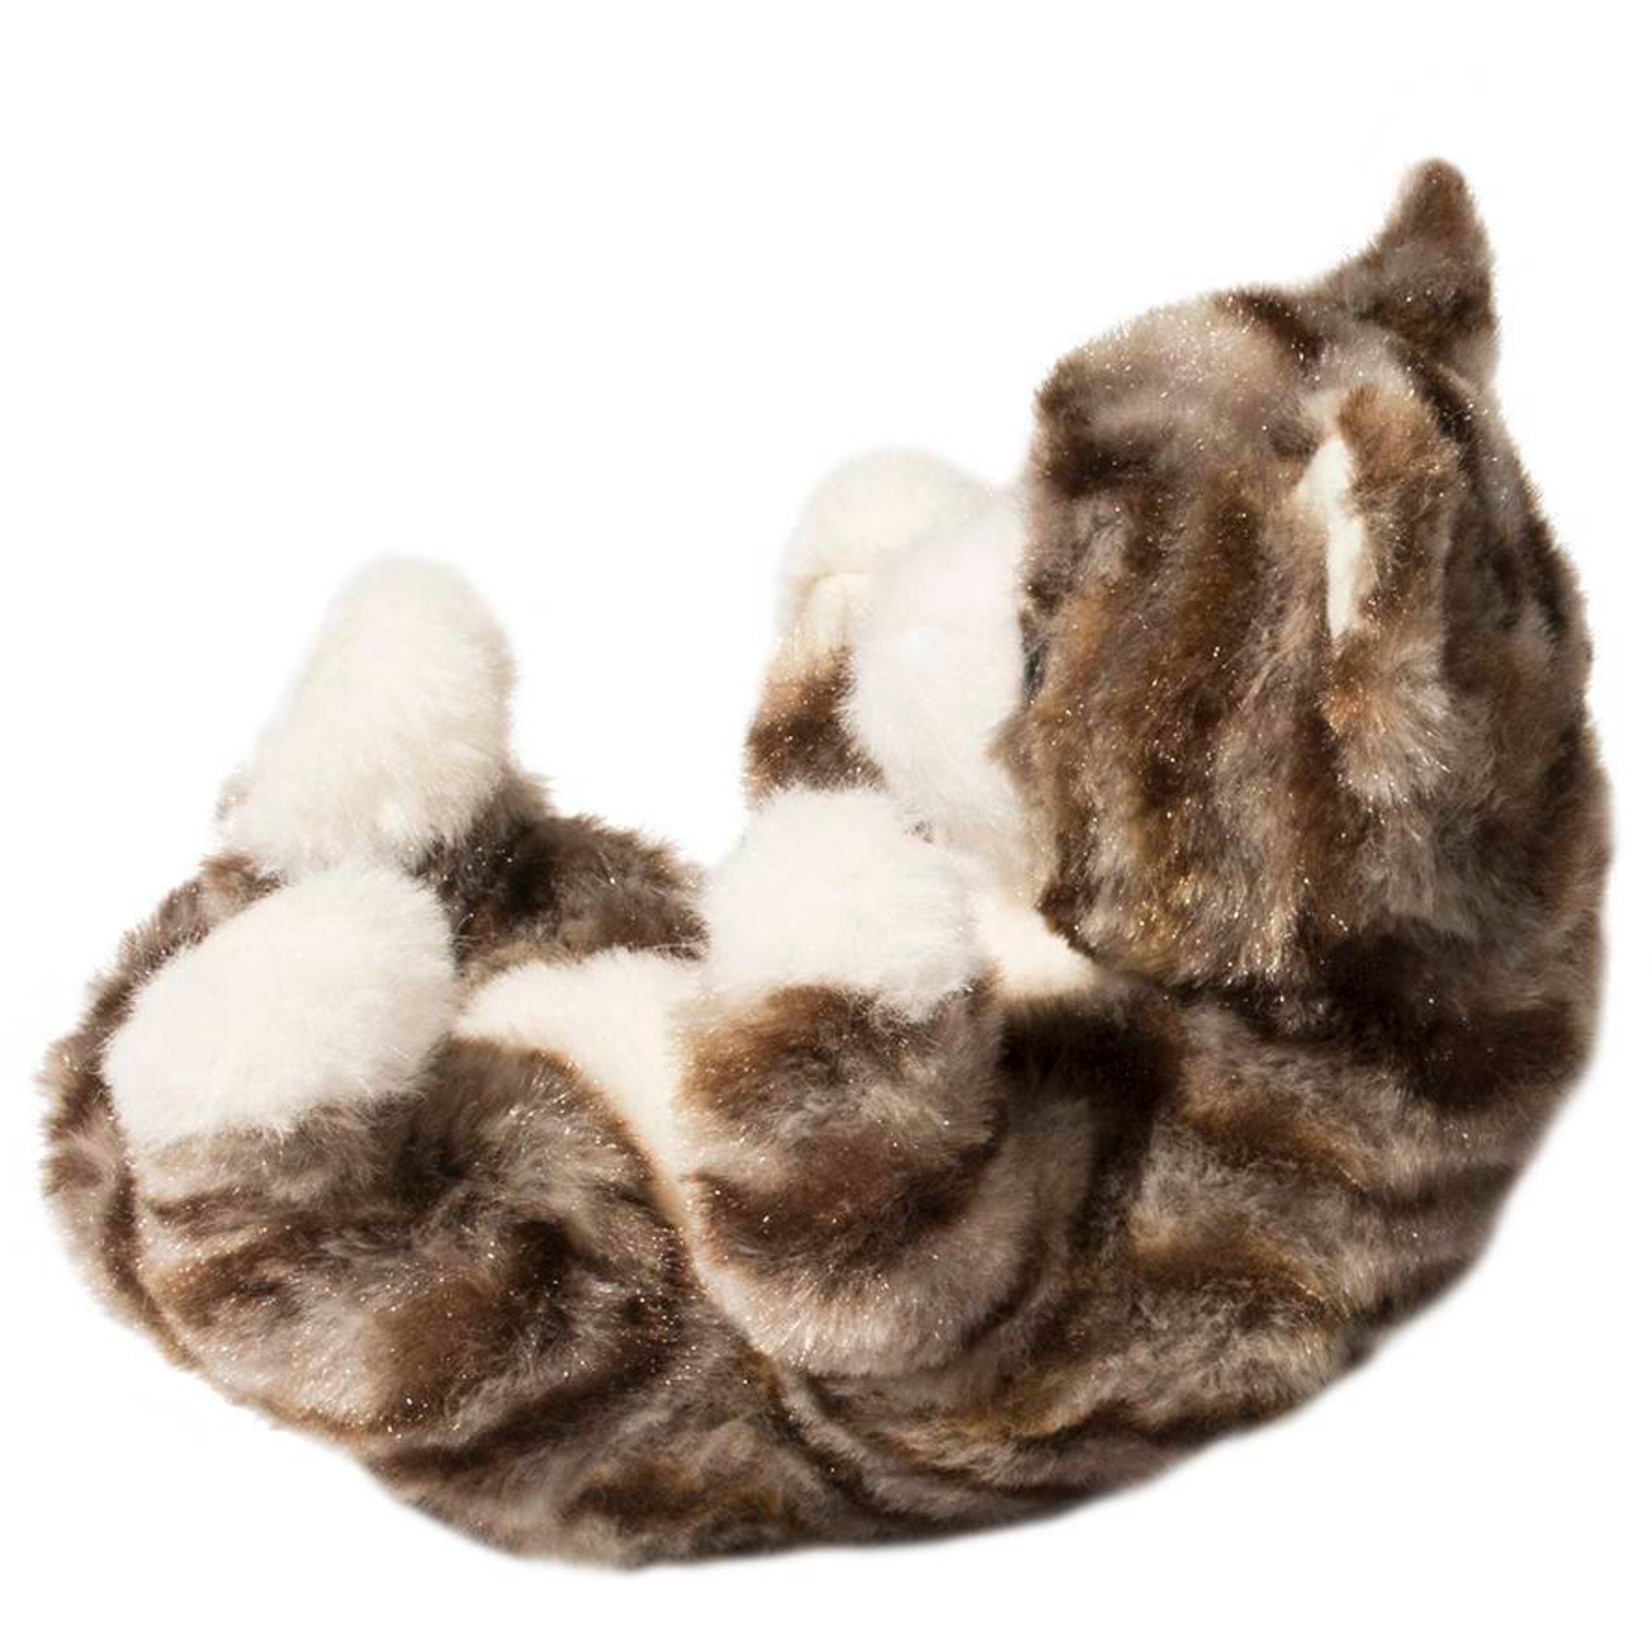 DOUGLAS GRAY STRIPE CAT LIL HANDFUL